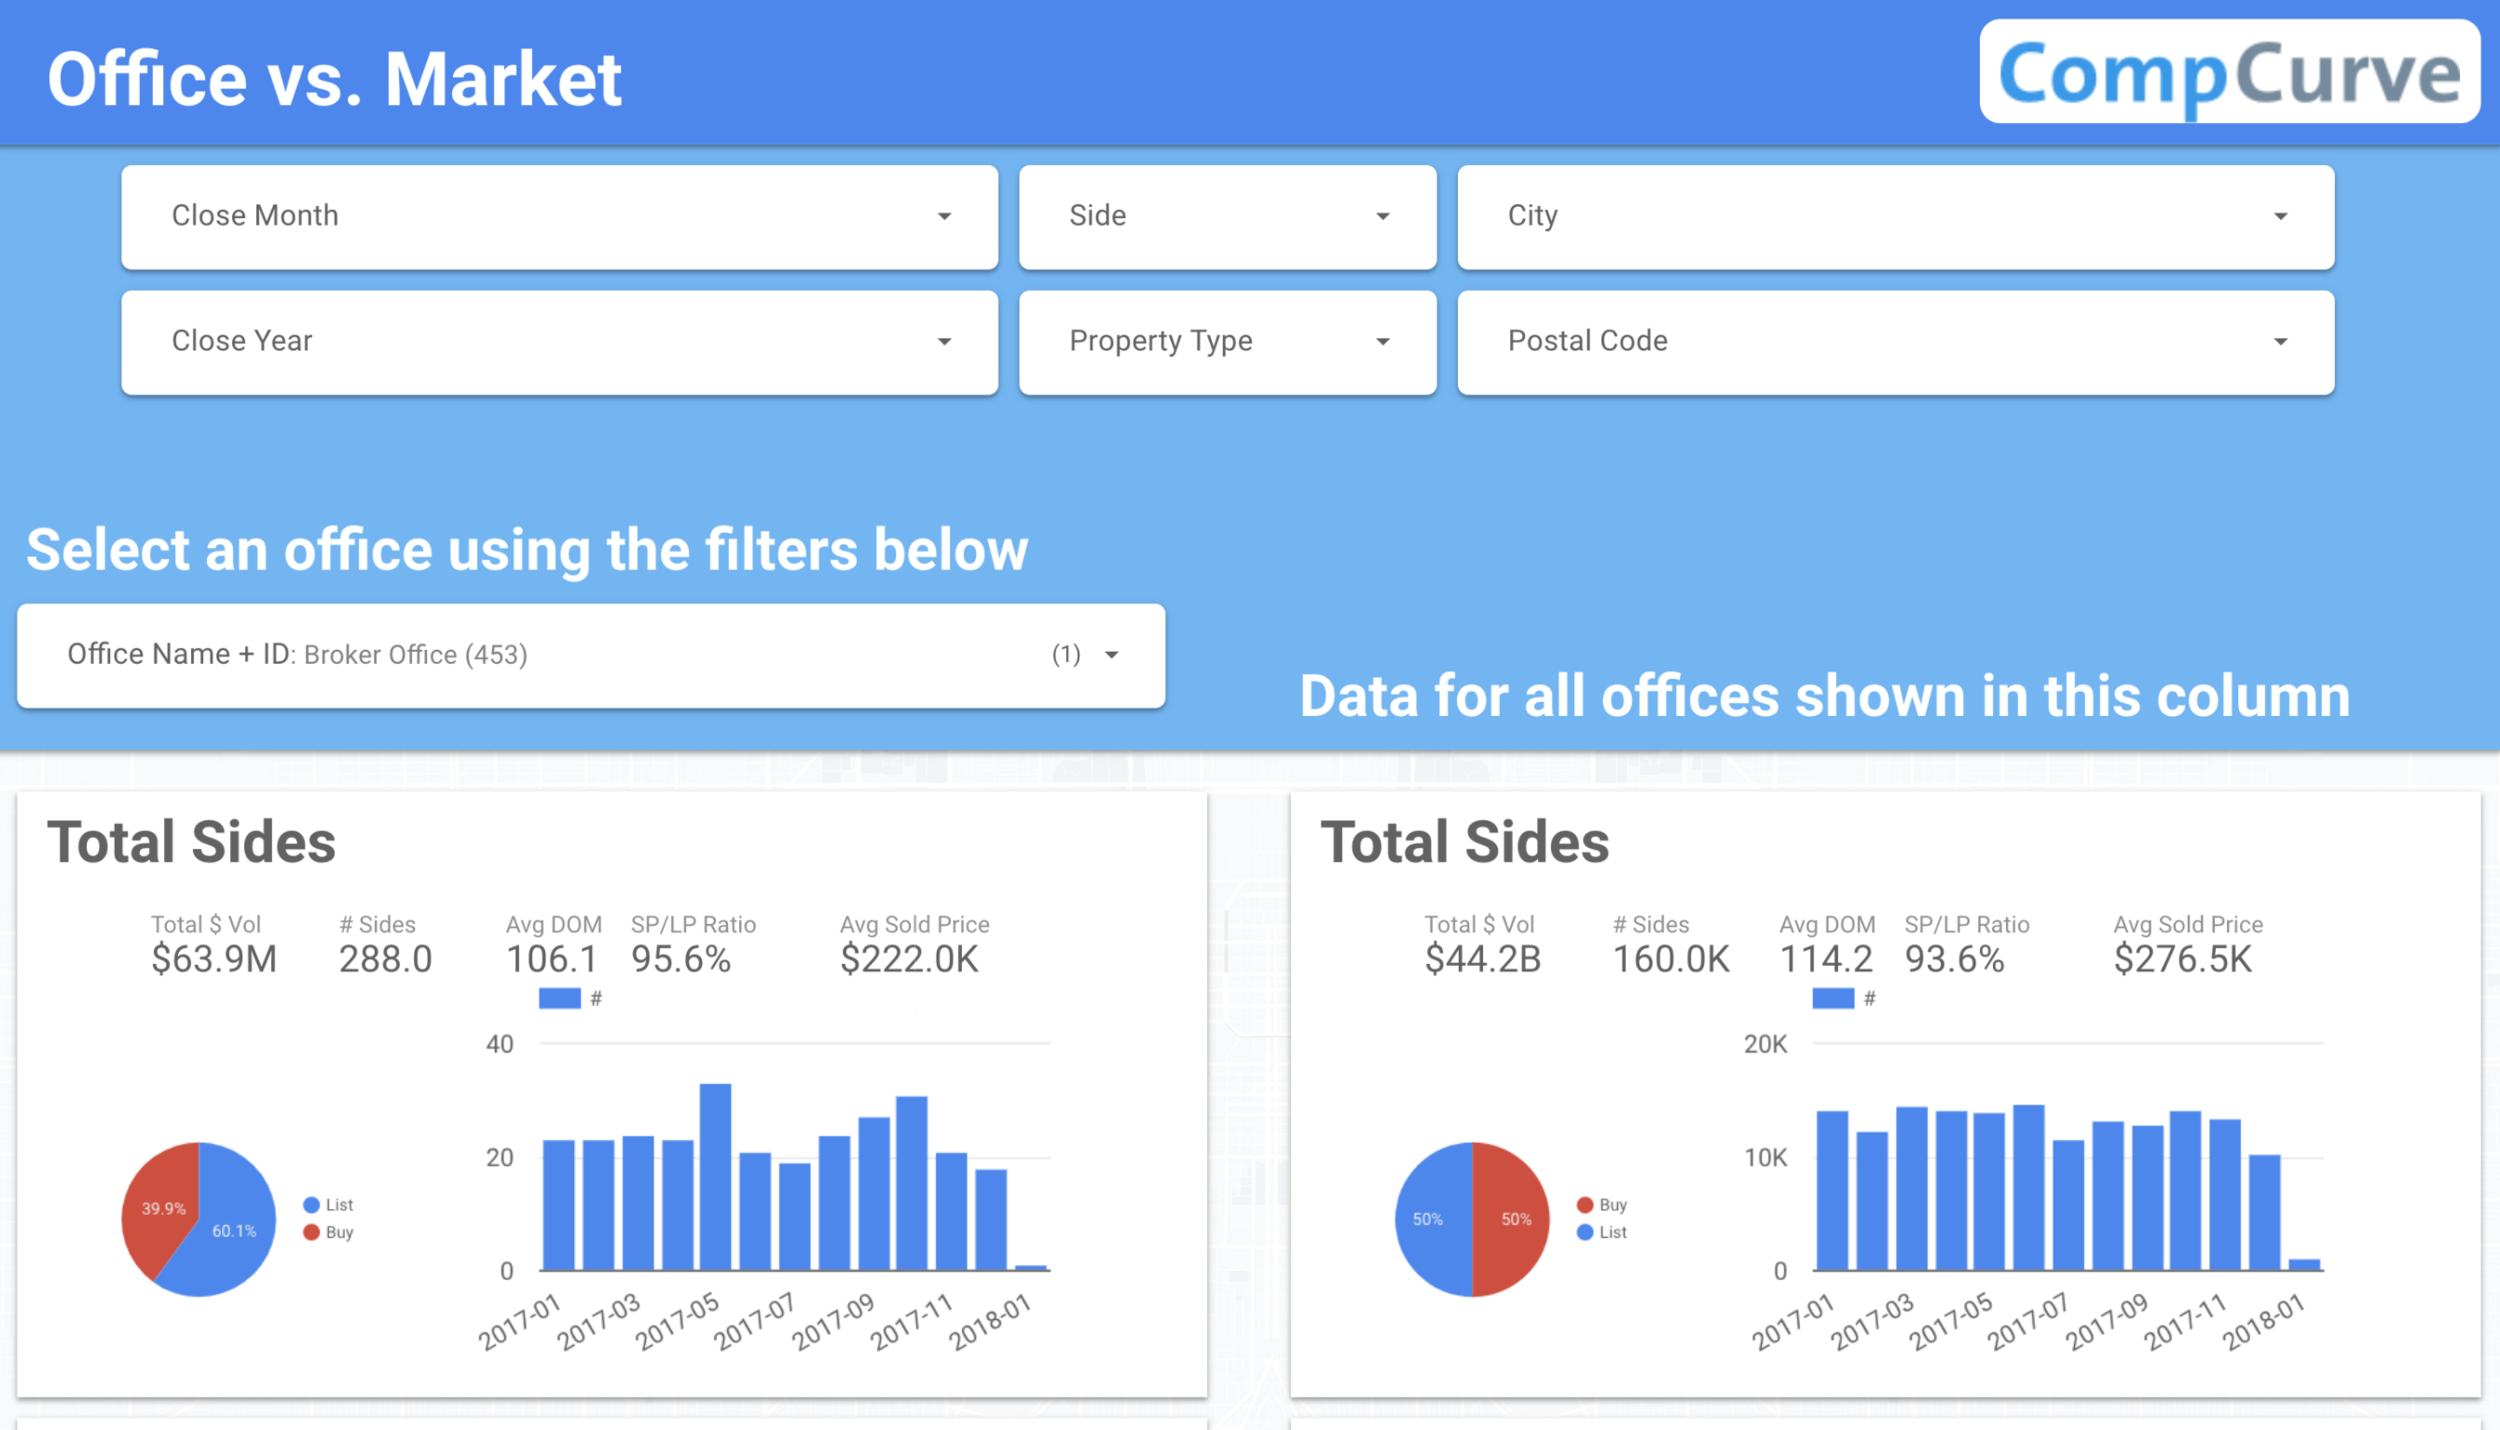 Office vs. Market Trends